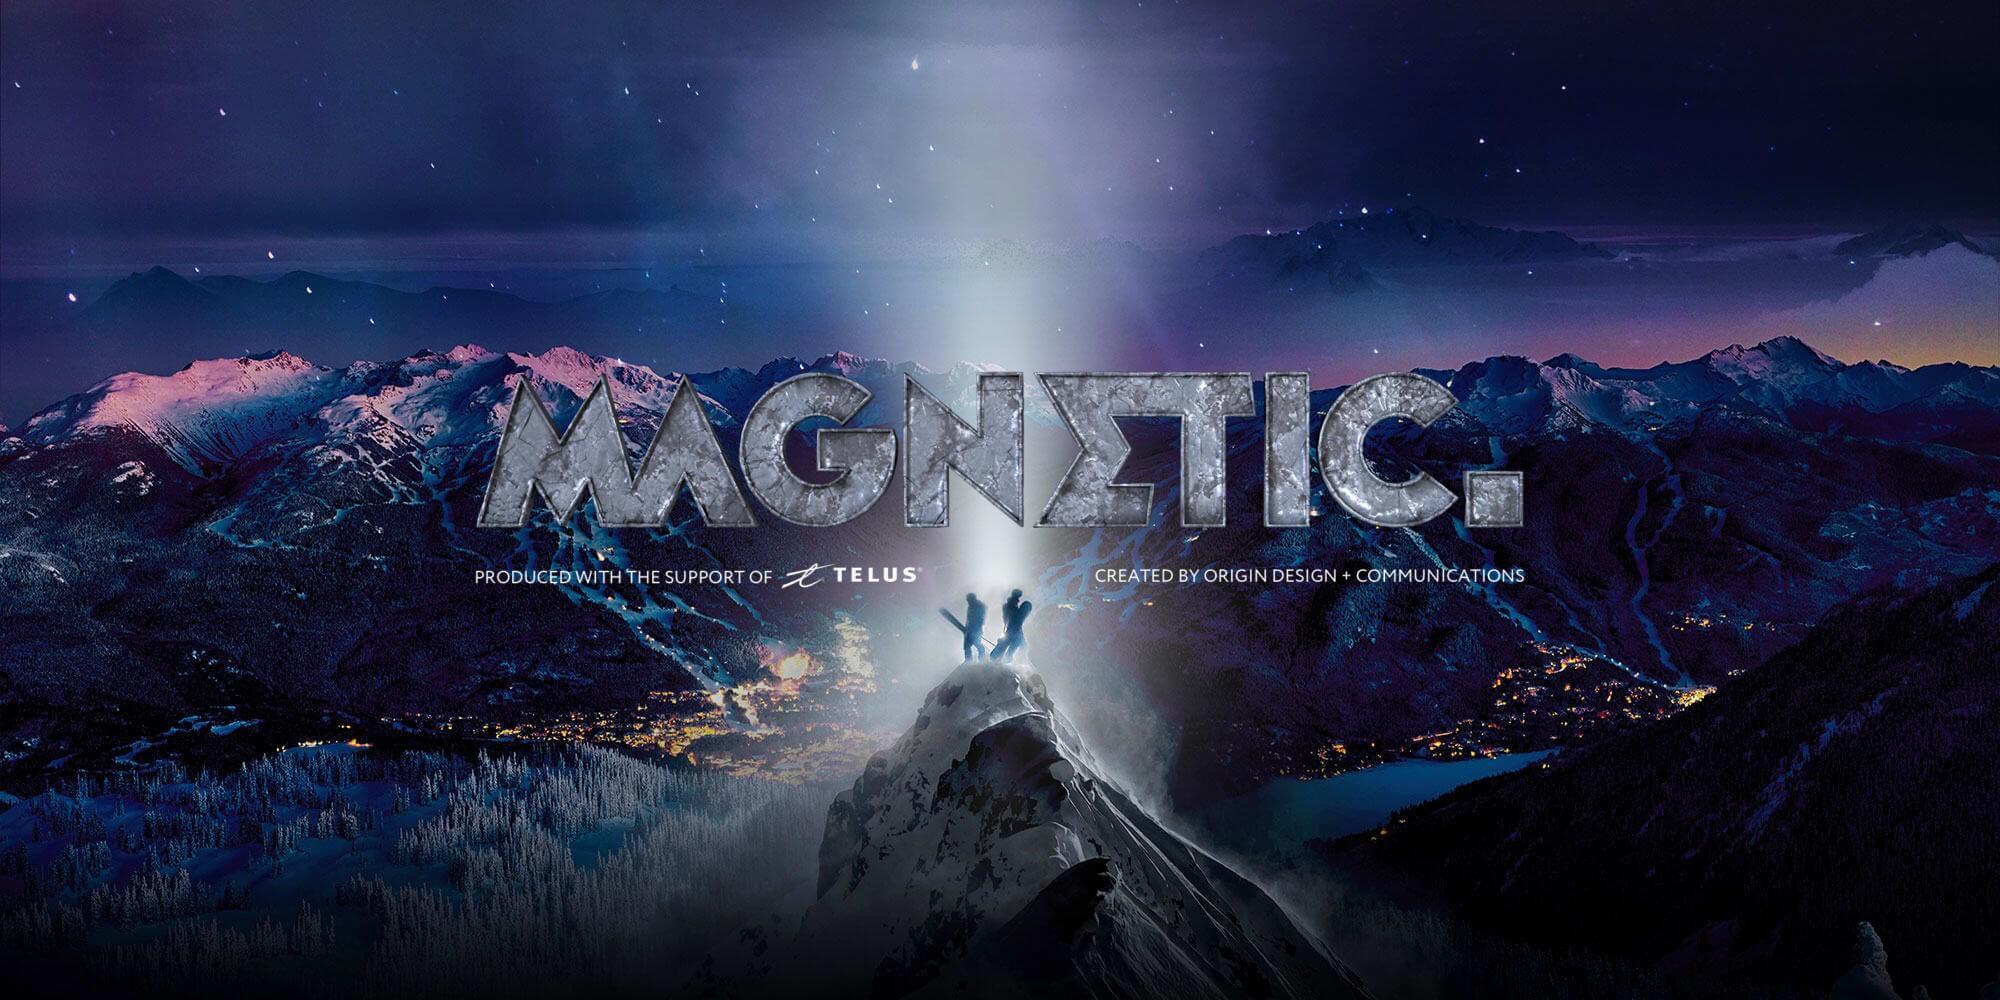 Magnetic - A Whistler Blackcomb ski film